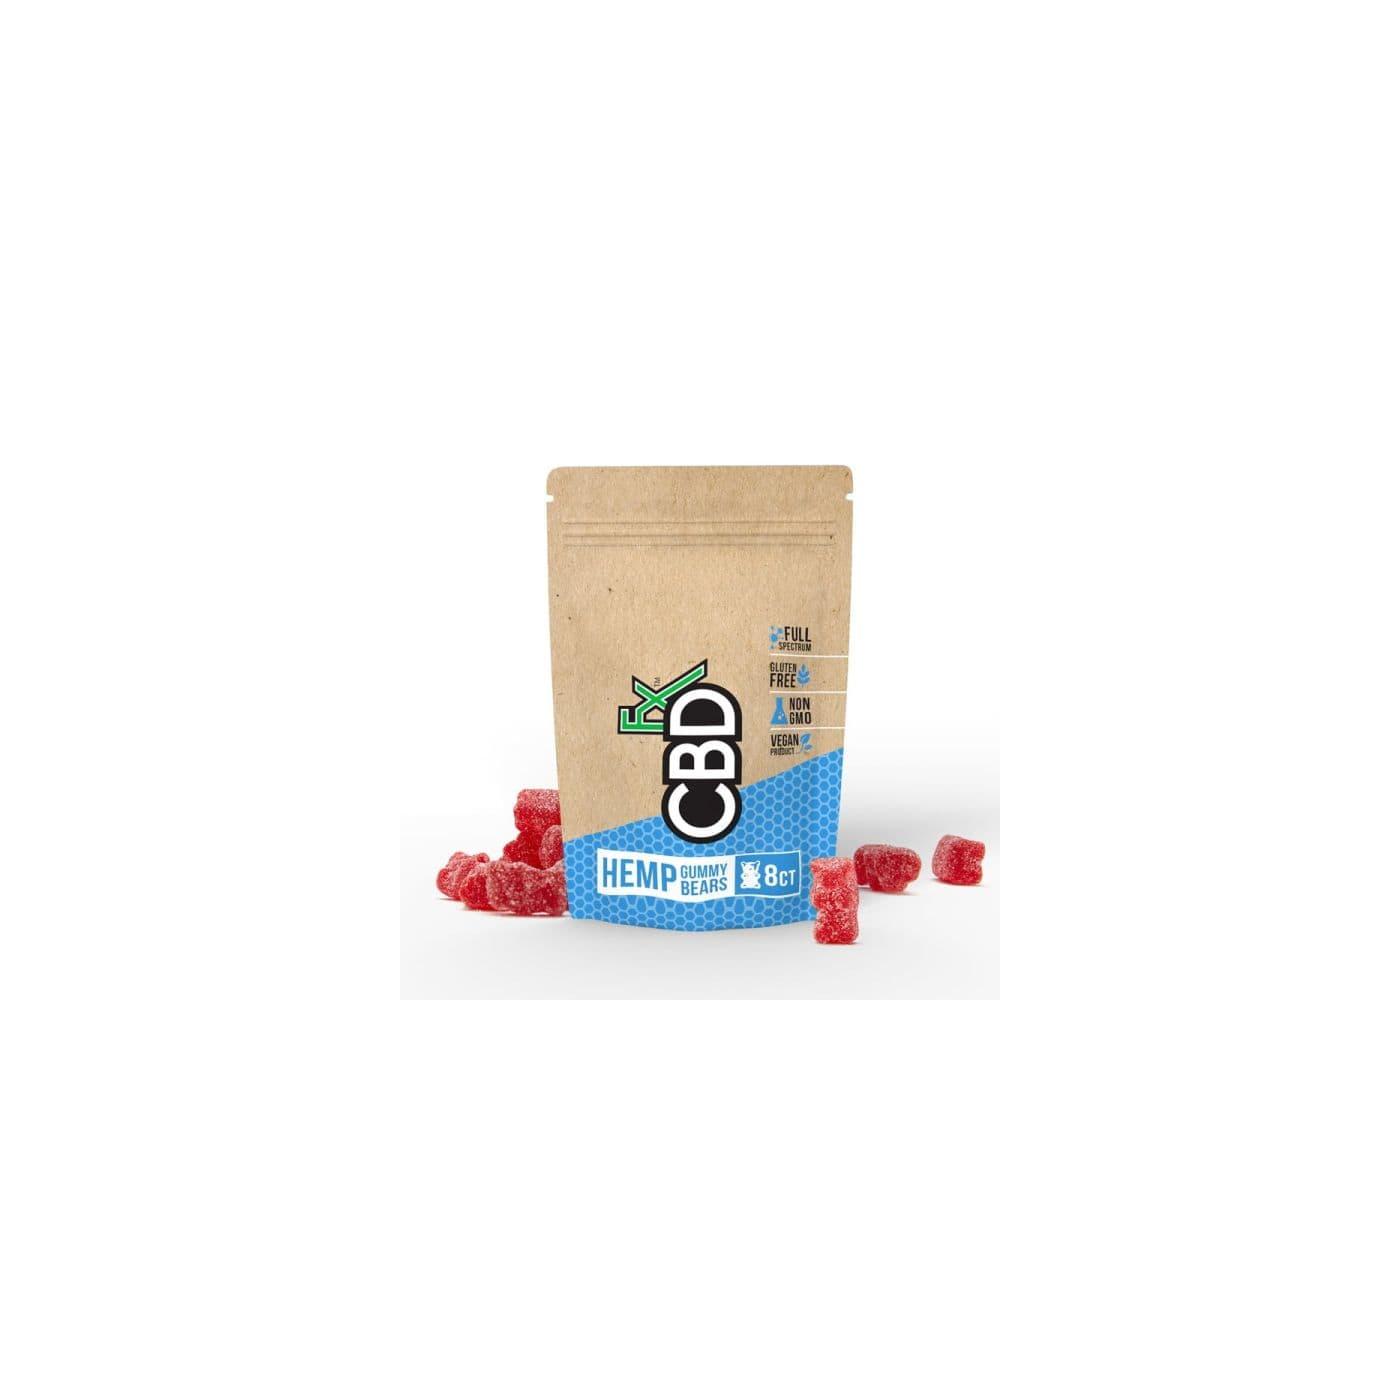 fx Gummies - 8 Pack - 40 mg